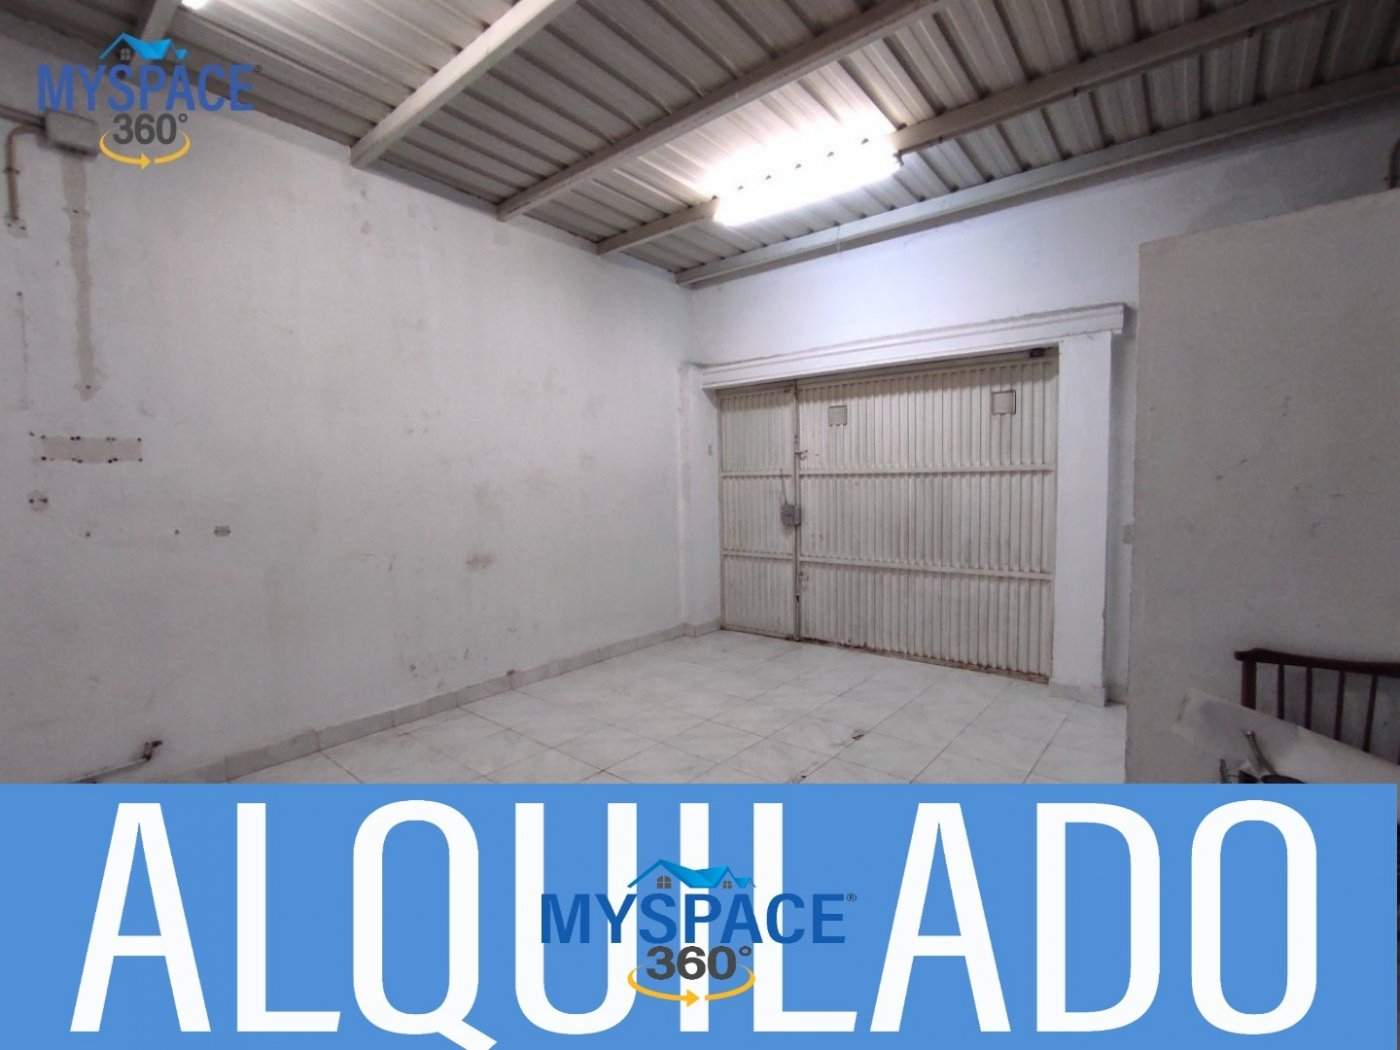 Garaje en alquiler en Centro, avila